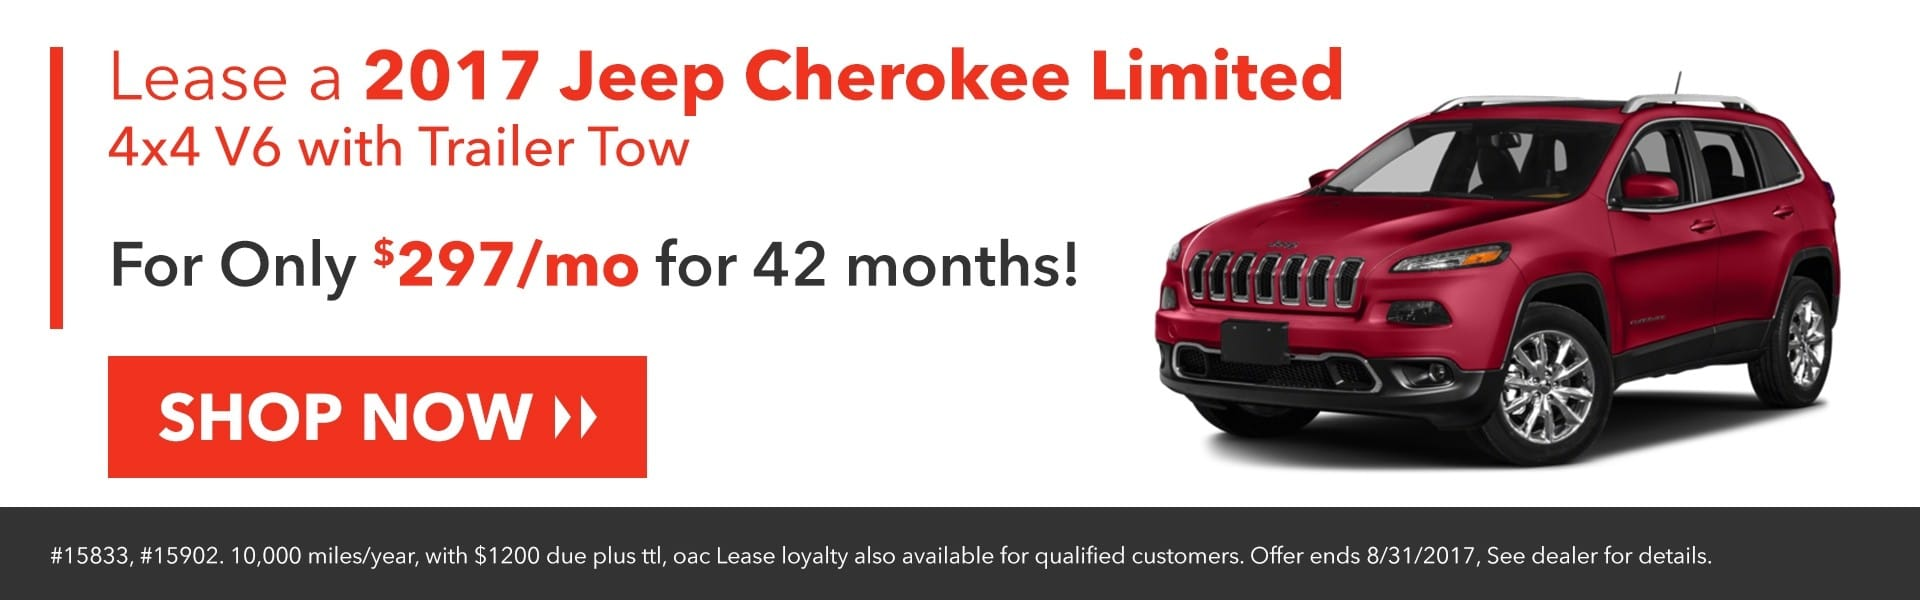 waconia dodge jeep cherokee